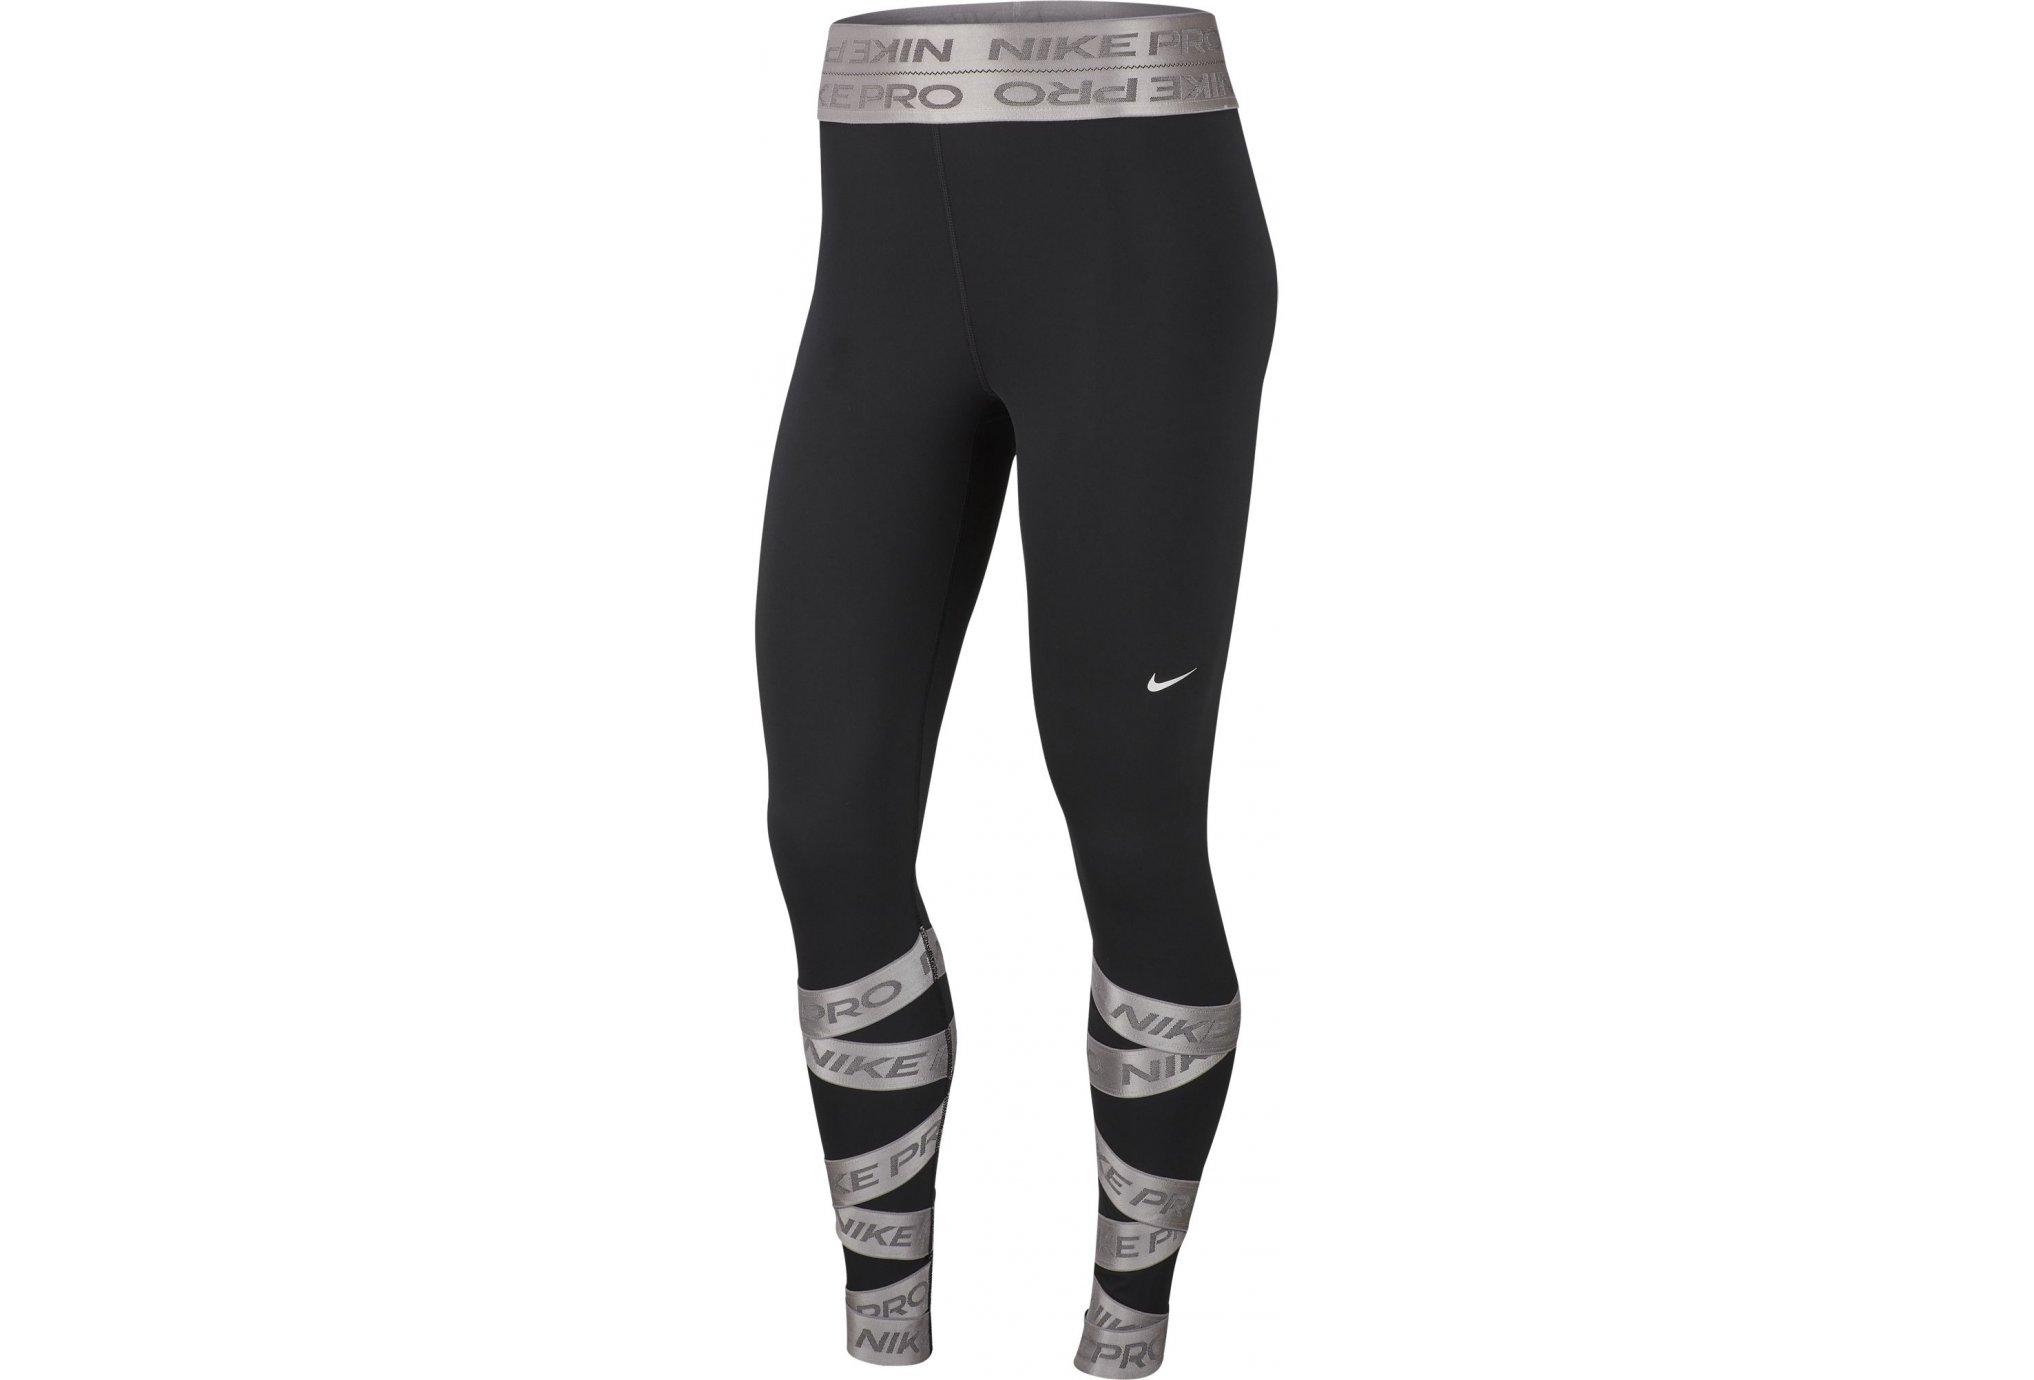 Nike mallas Pro Elastic 7/8 vêtement running femme